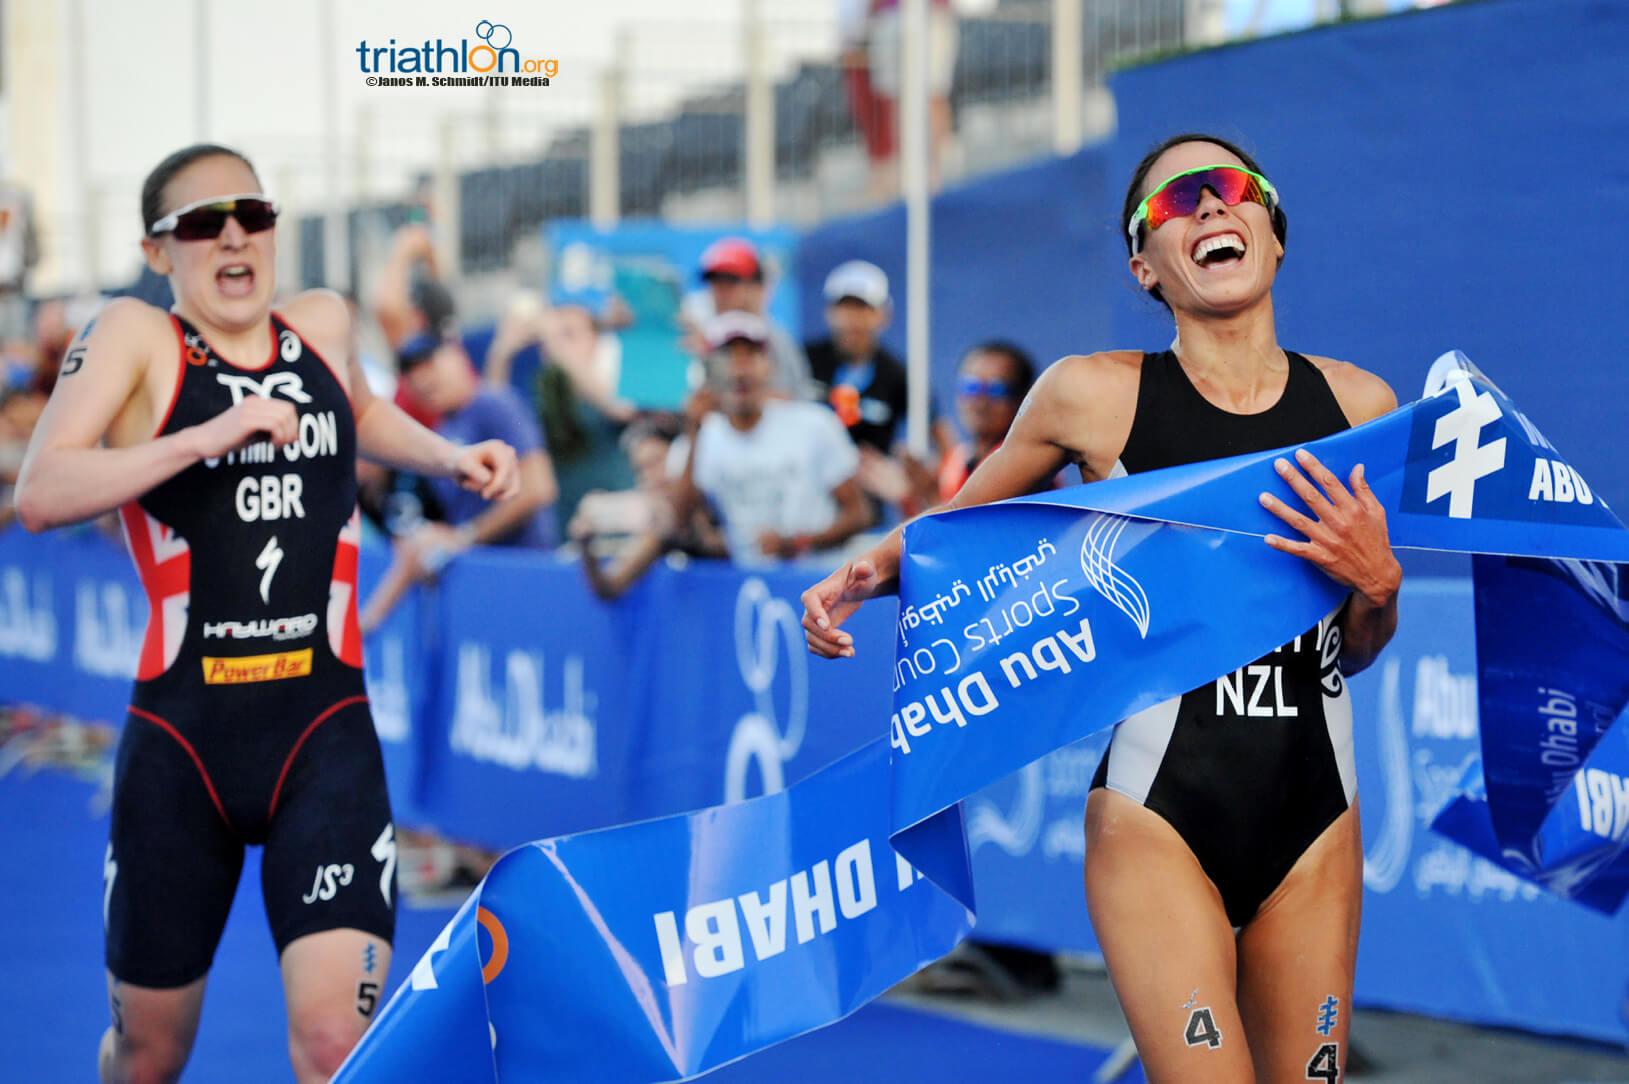 Andrea Hewitt wins in Abu Dhabi